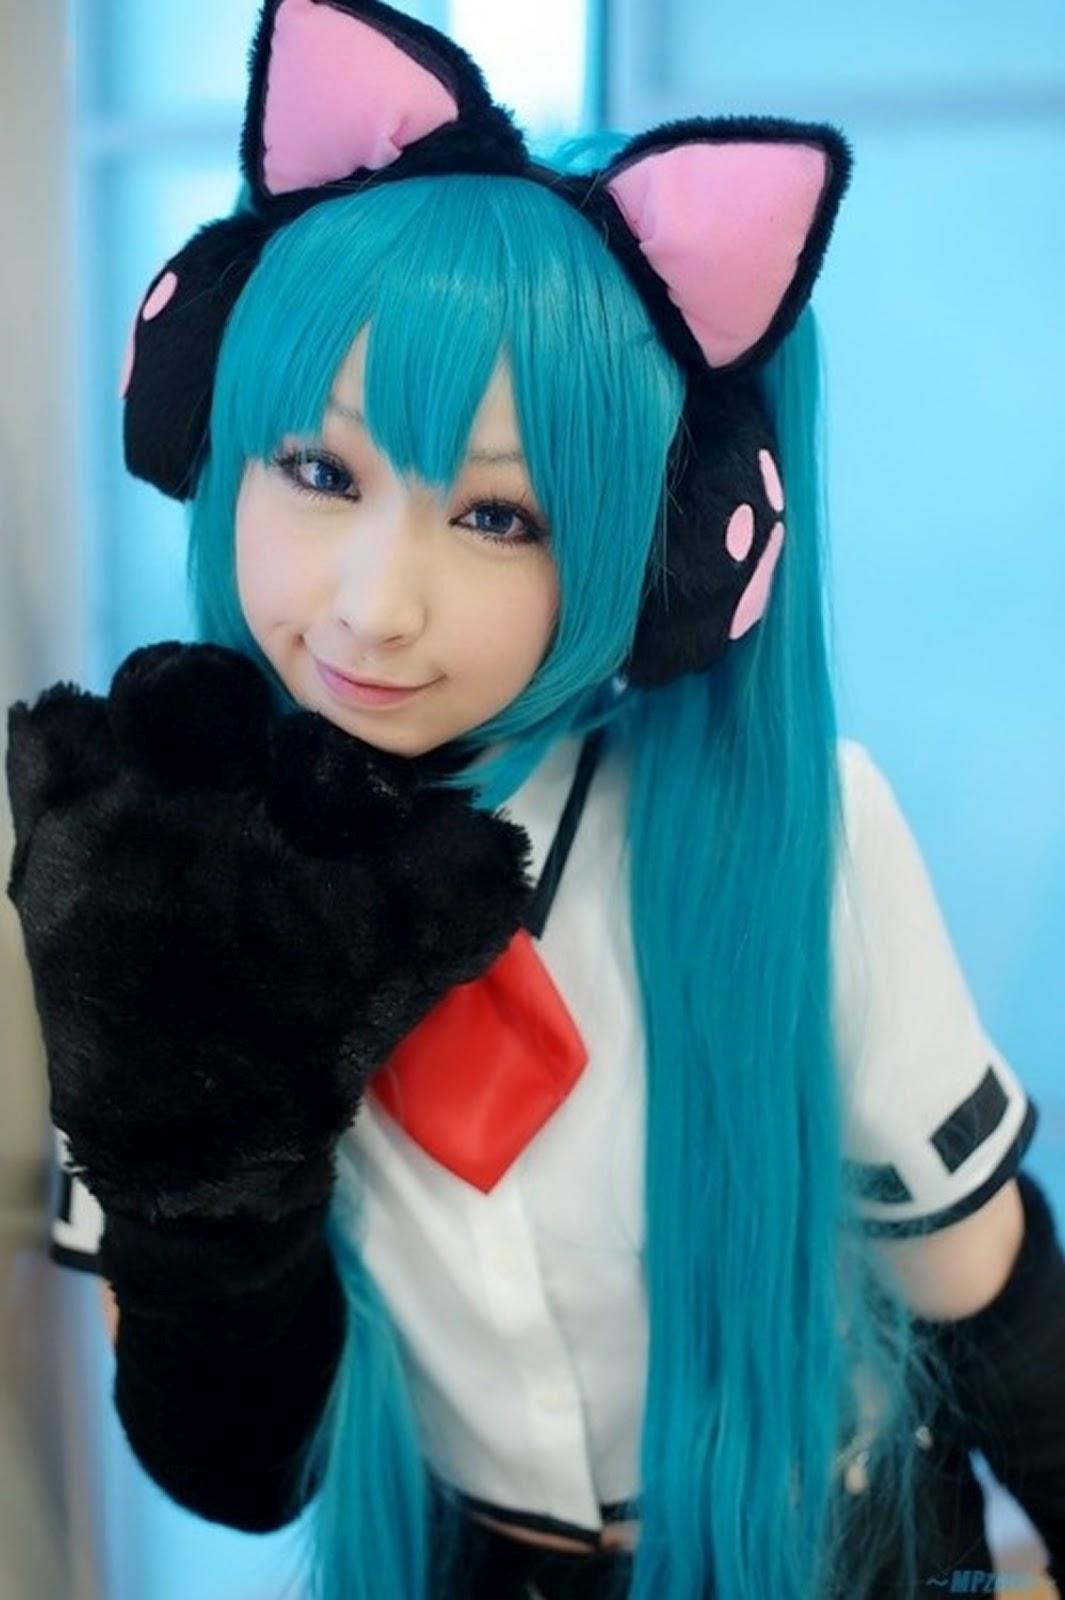 Anime Cosplay 07/06/12